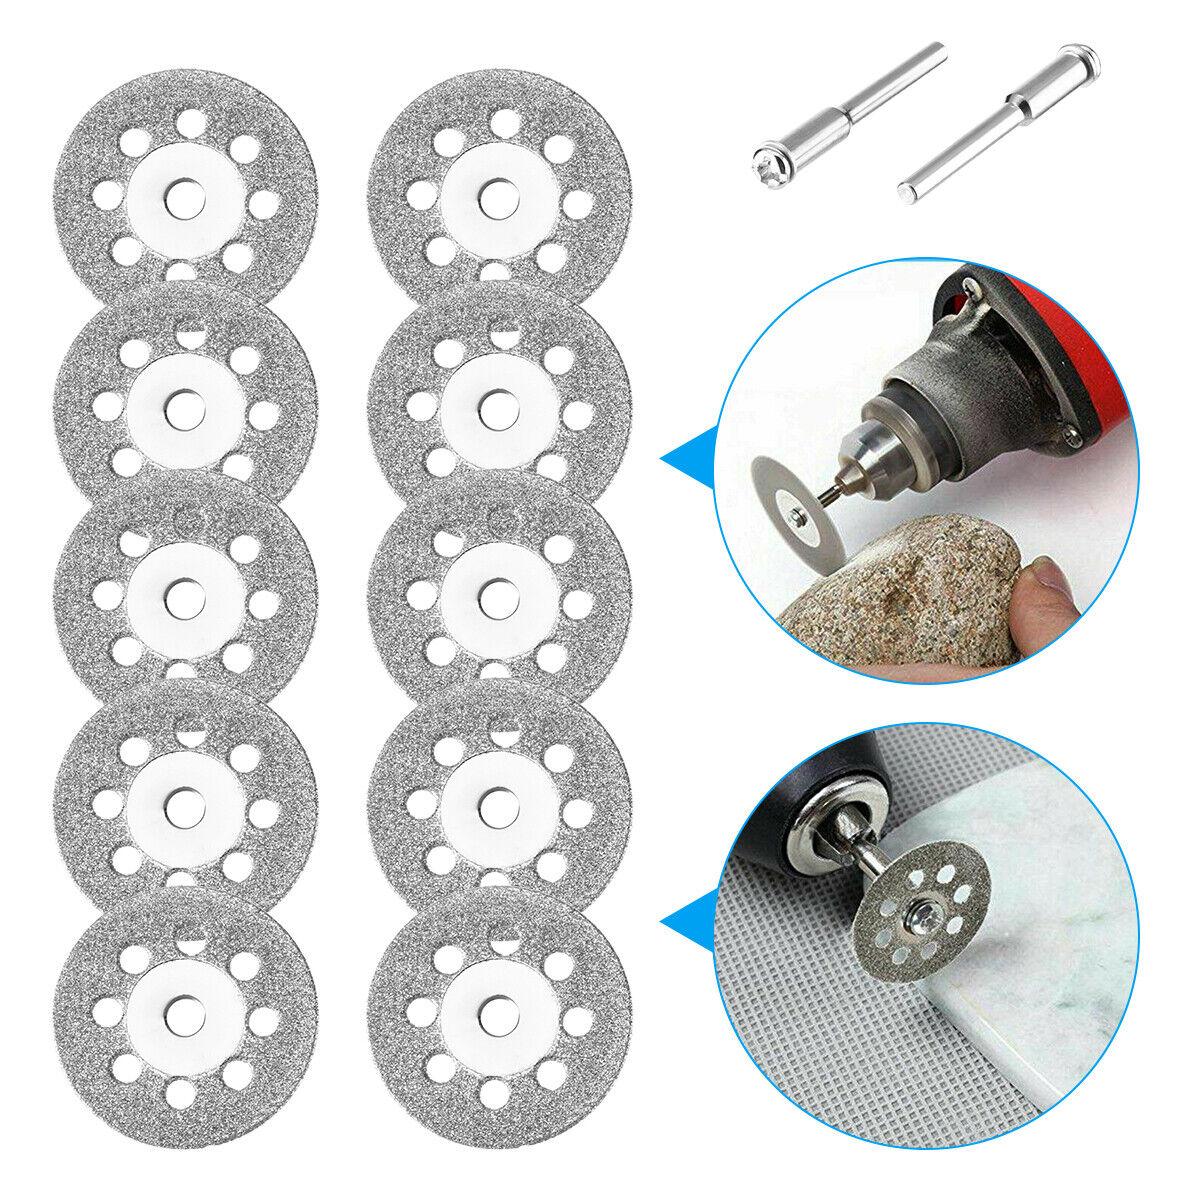 30* Diamond Cutting Wheels Rotary Die Grinder Cutter Cut Off Disc Tool Supplies